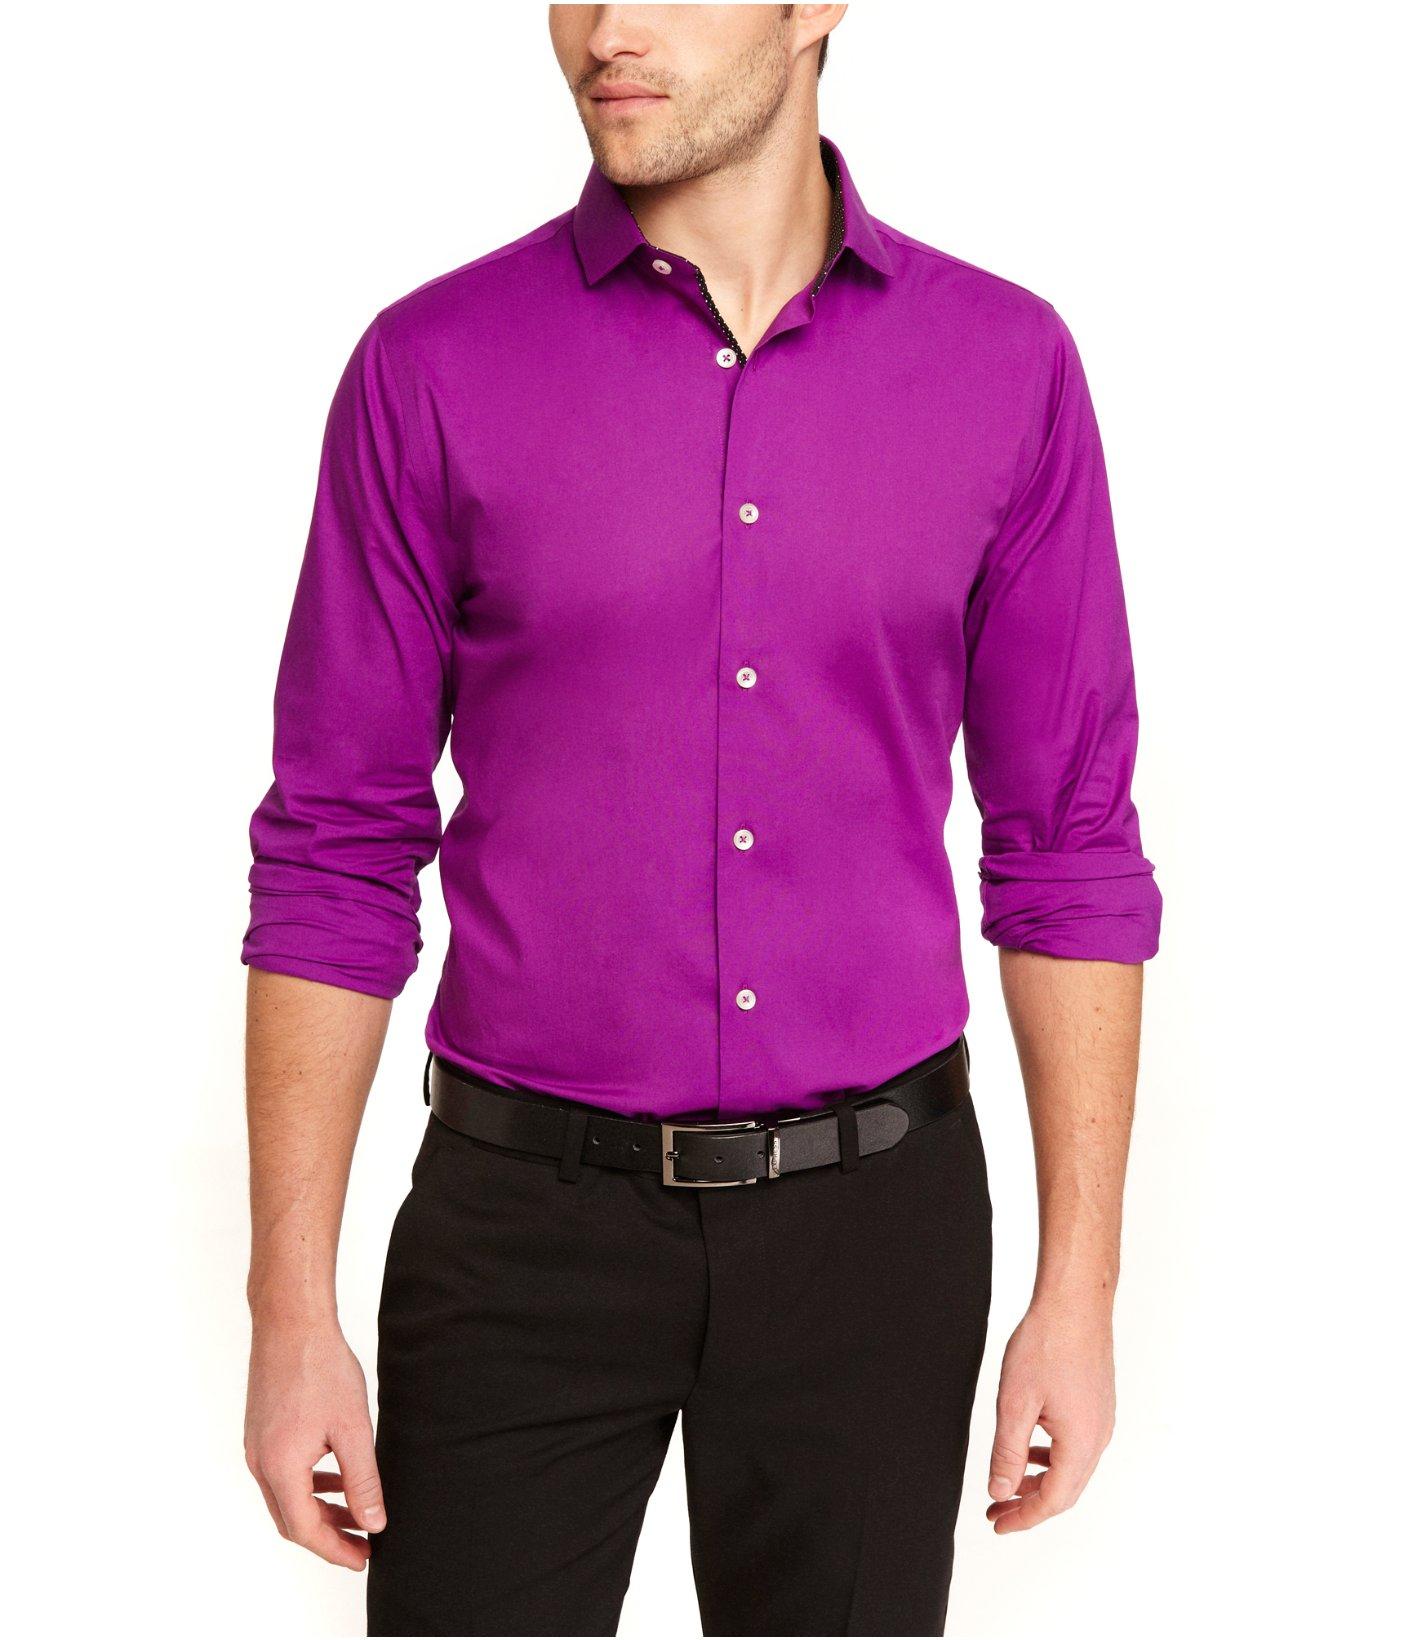 Express limited edition extra slim 1mx shirt dot trim in for Extra slim dress shirt